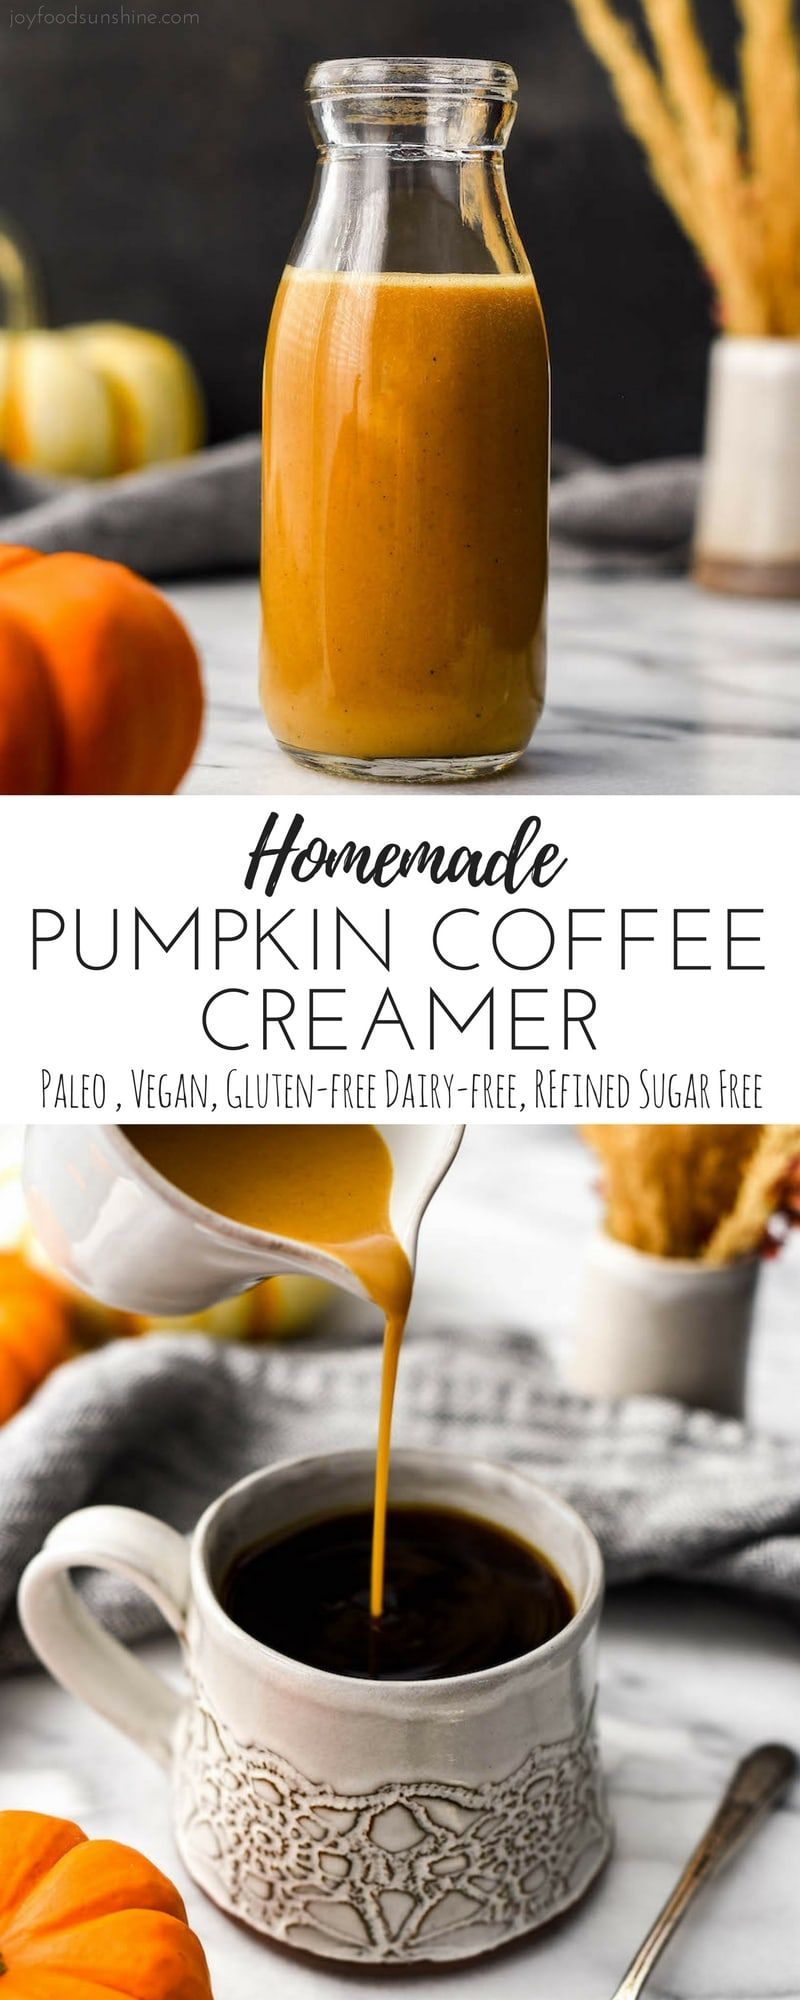 Paleo & Vegan Homemade Pumpkin Coffee Creamer recipe is a